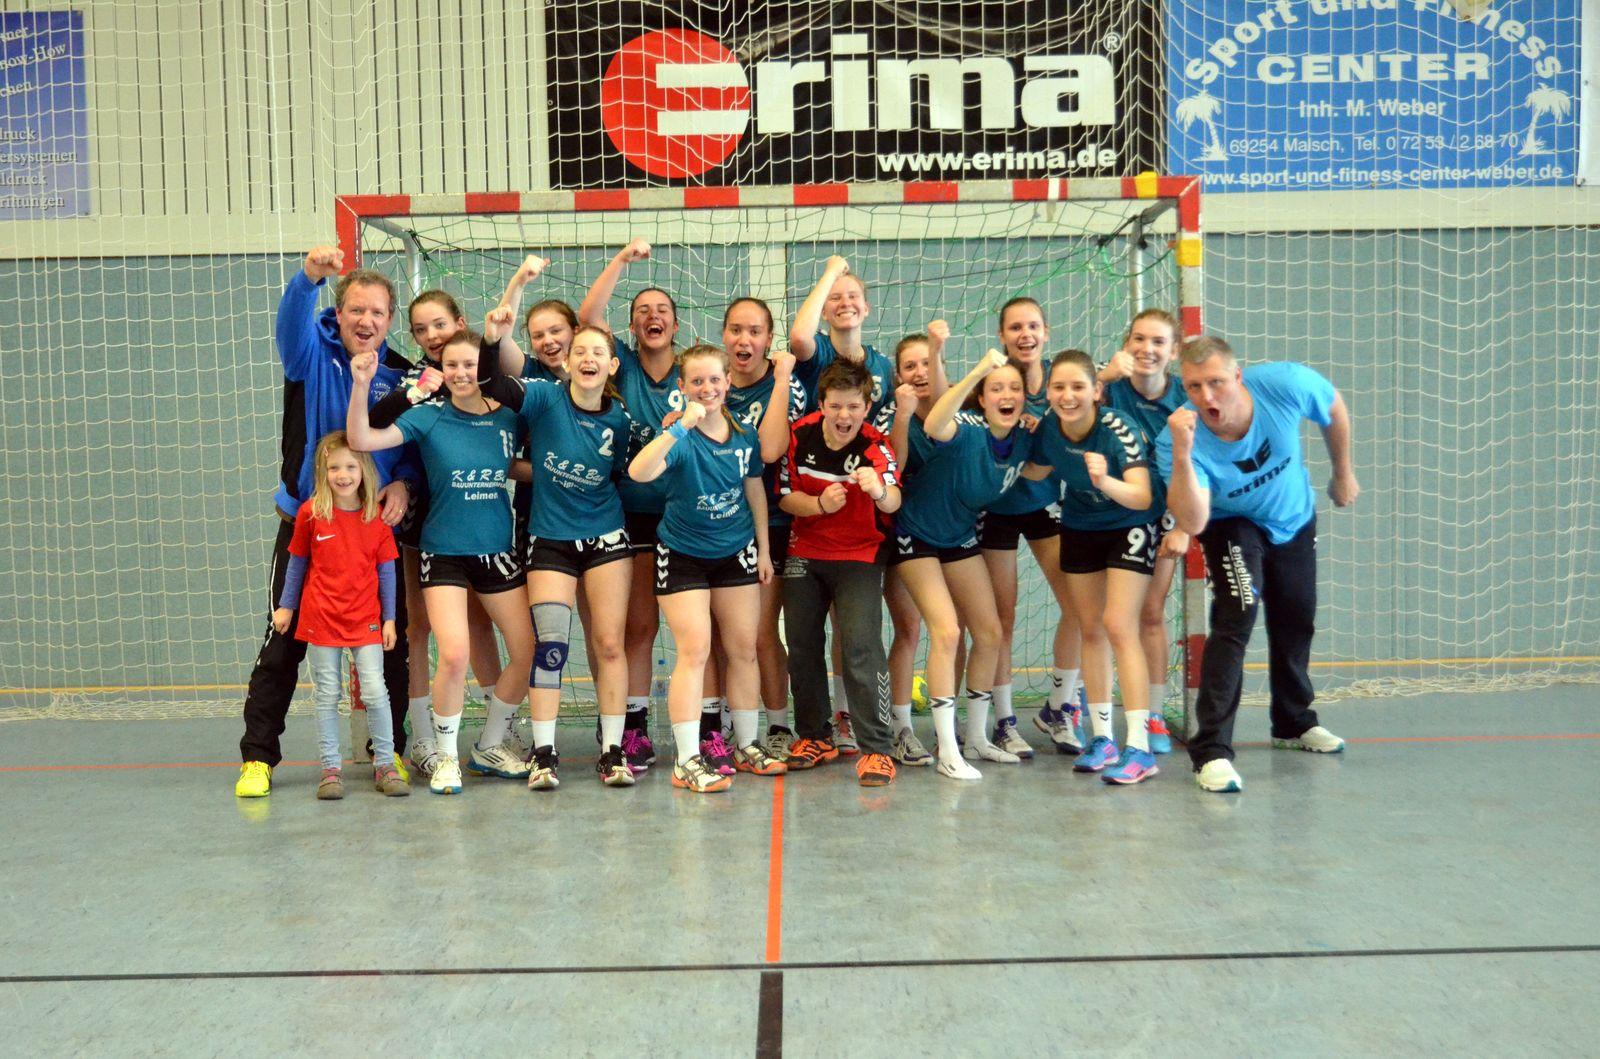 20160416_ASG RotMalsch - wJA_Badenligaquali-Rückspiel_DSC_8090